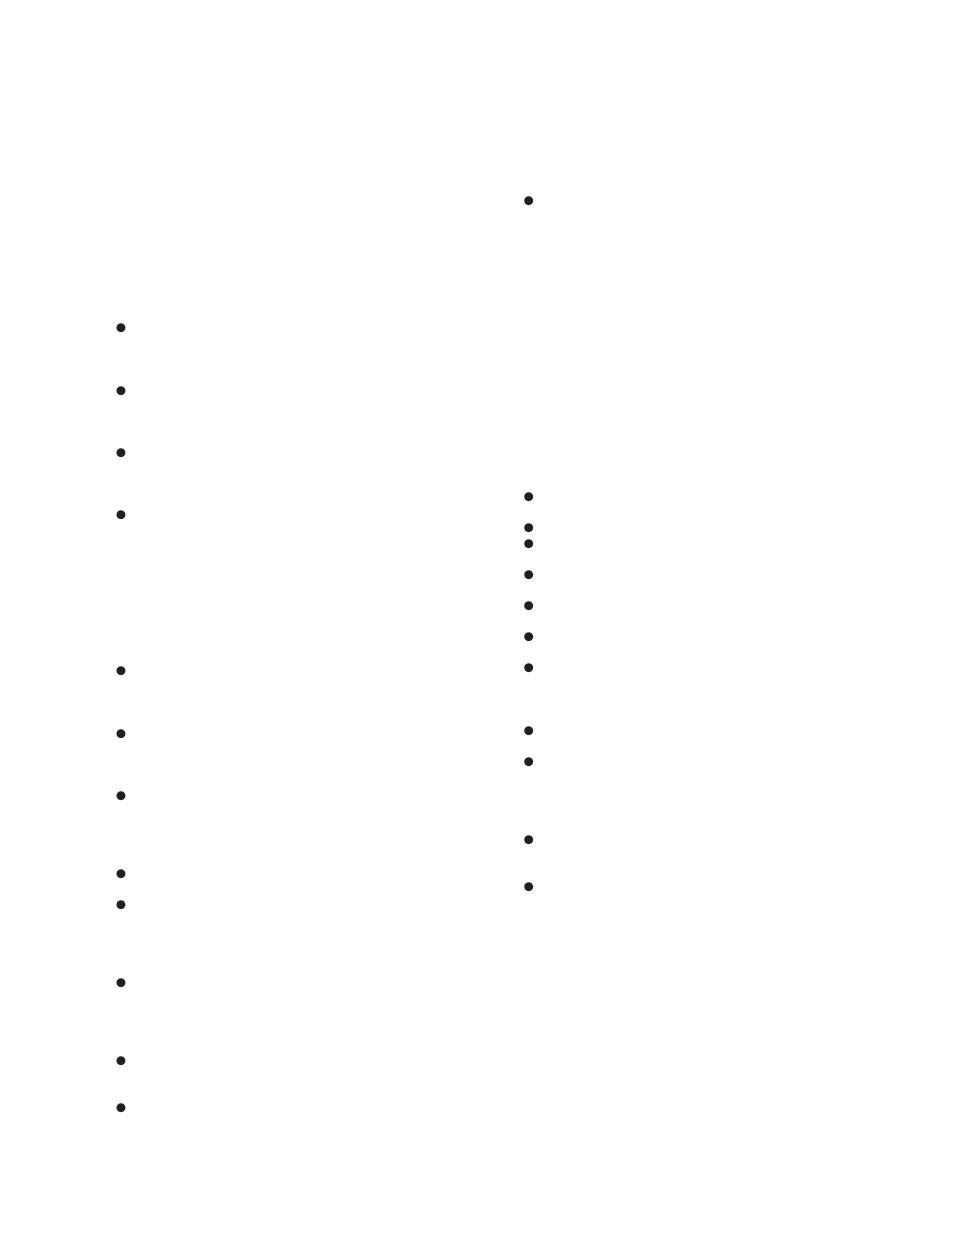 Hustler Turf FasTrak Super Duty 36 User Manual | Page 6 / 34